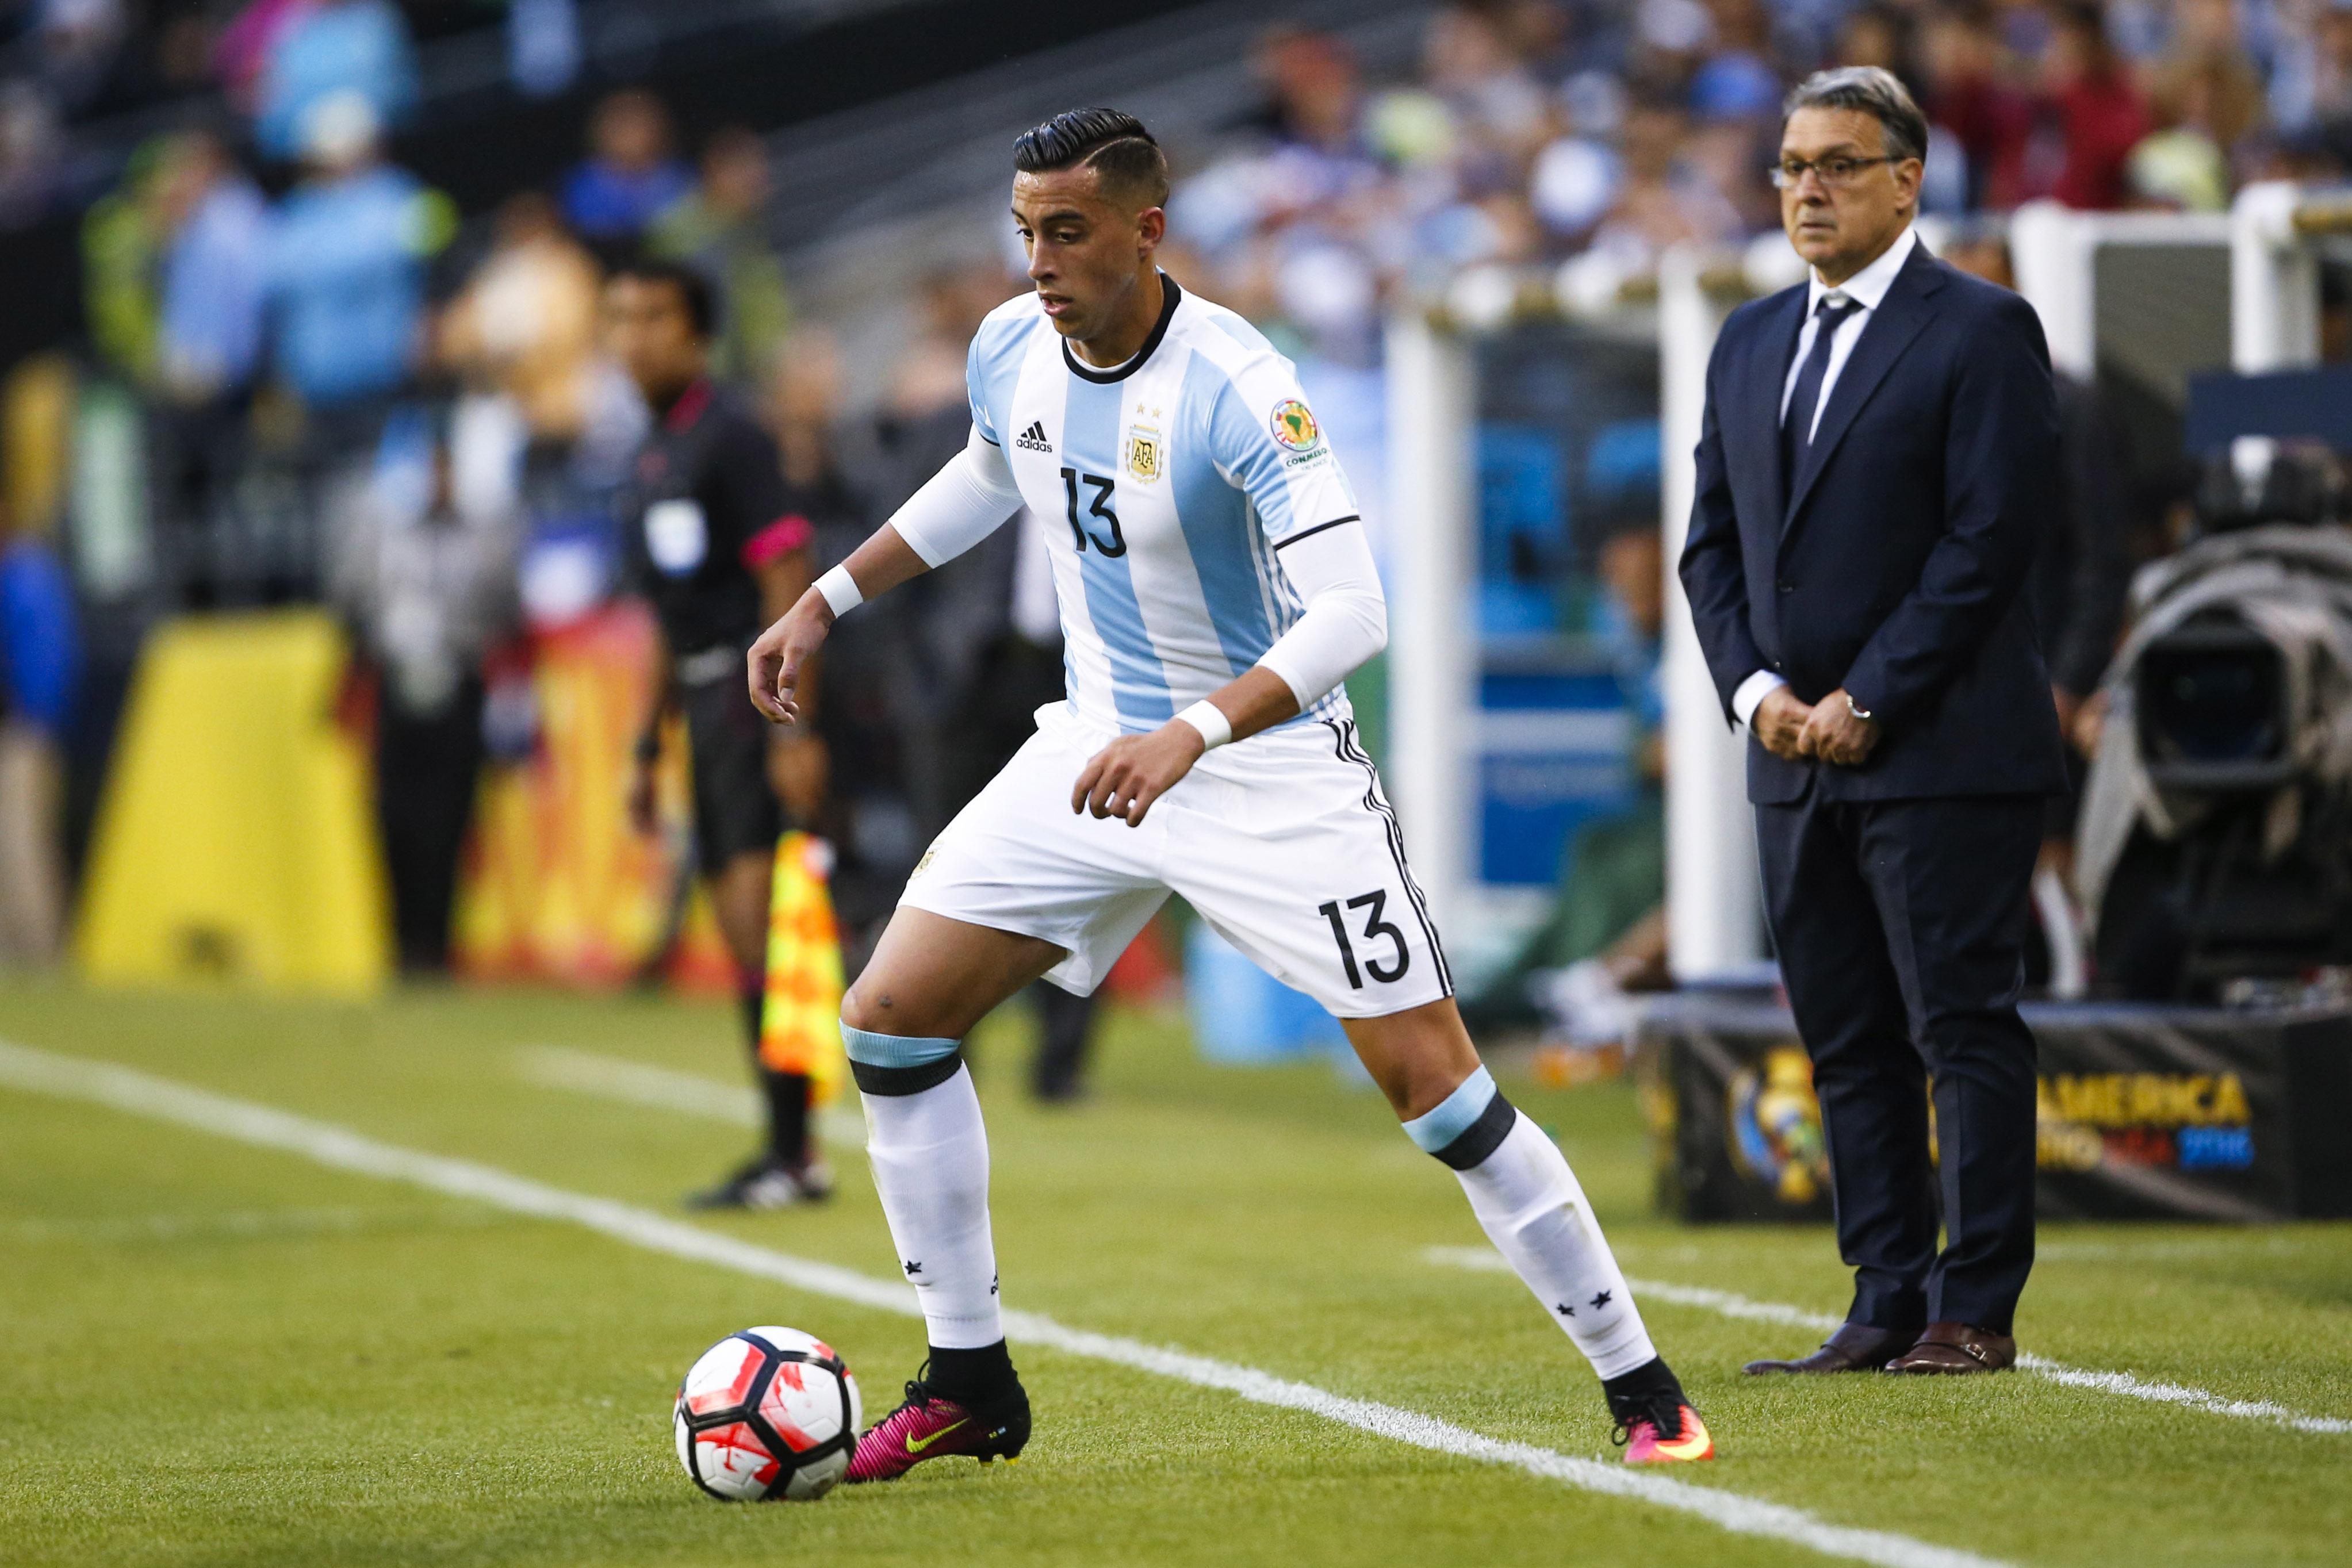 Soccer: 2016 Copa America Centenario-Argentina at Bolivia